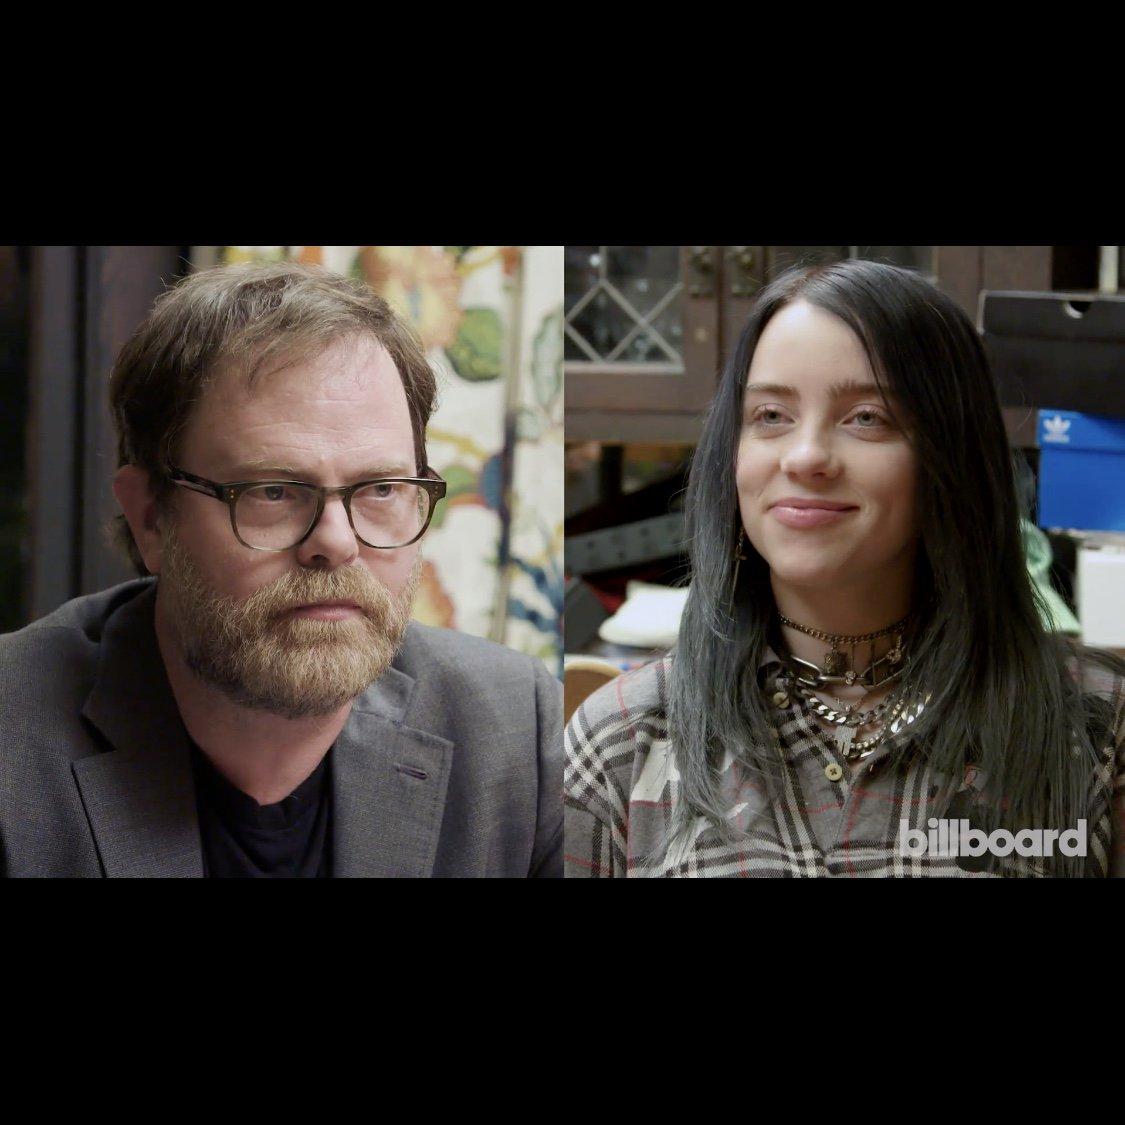 Watch Billie take 'The Office' Quiz with @rainnwilson. @billboard https://www.youtube.com/watch?v=ibbkmS_tvVQ…